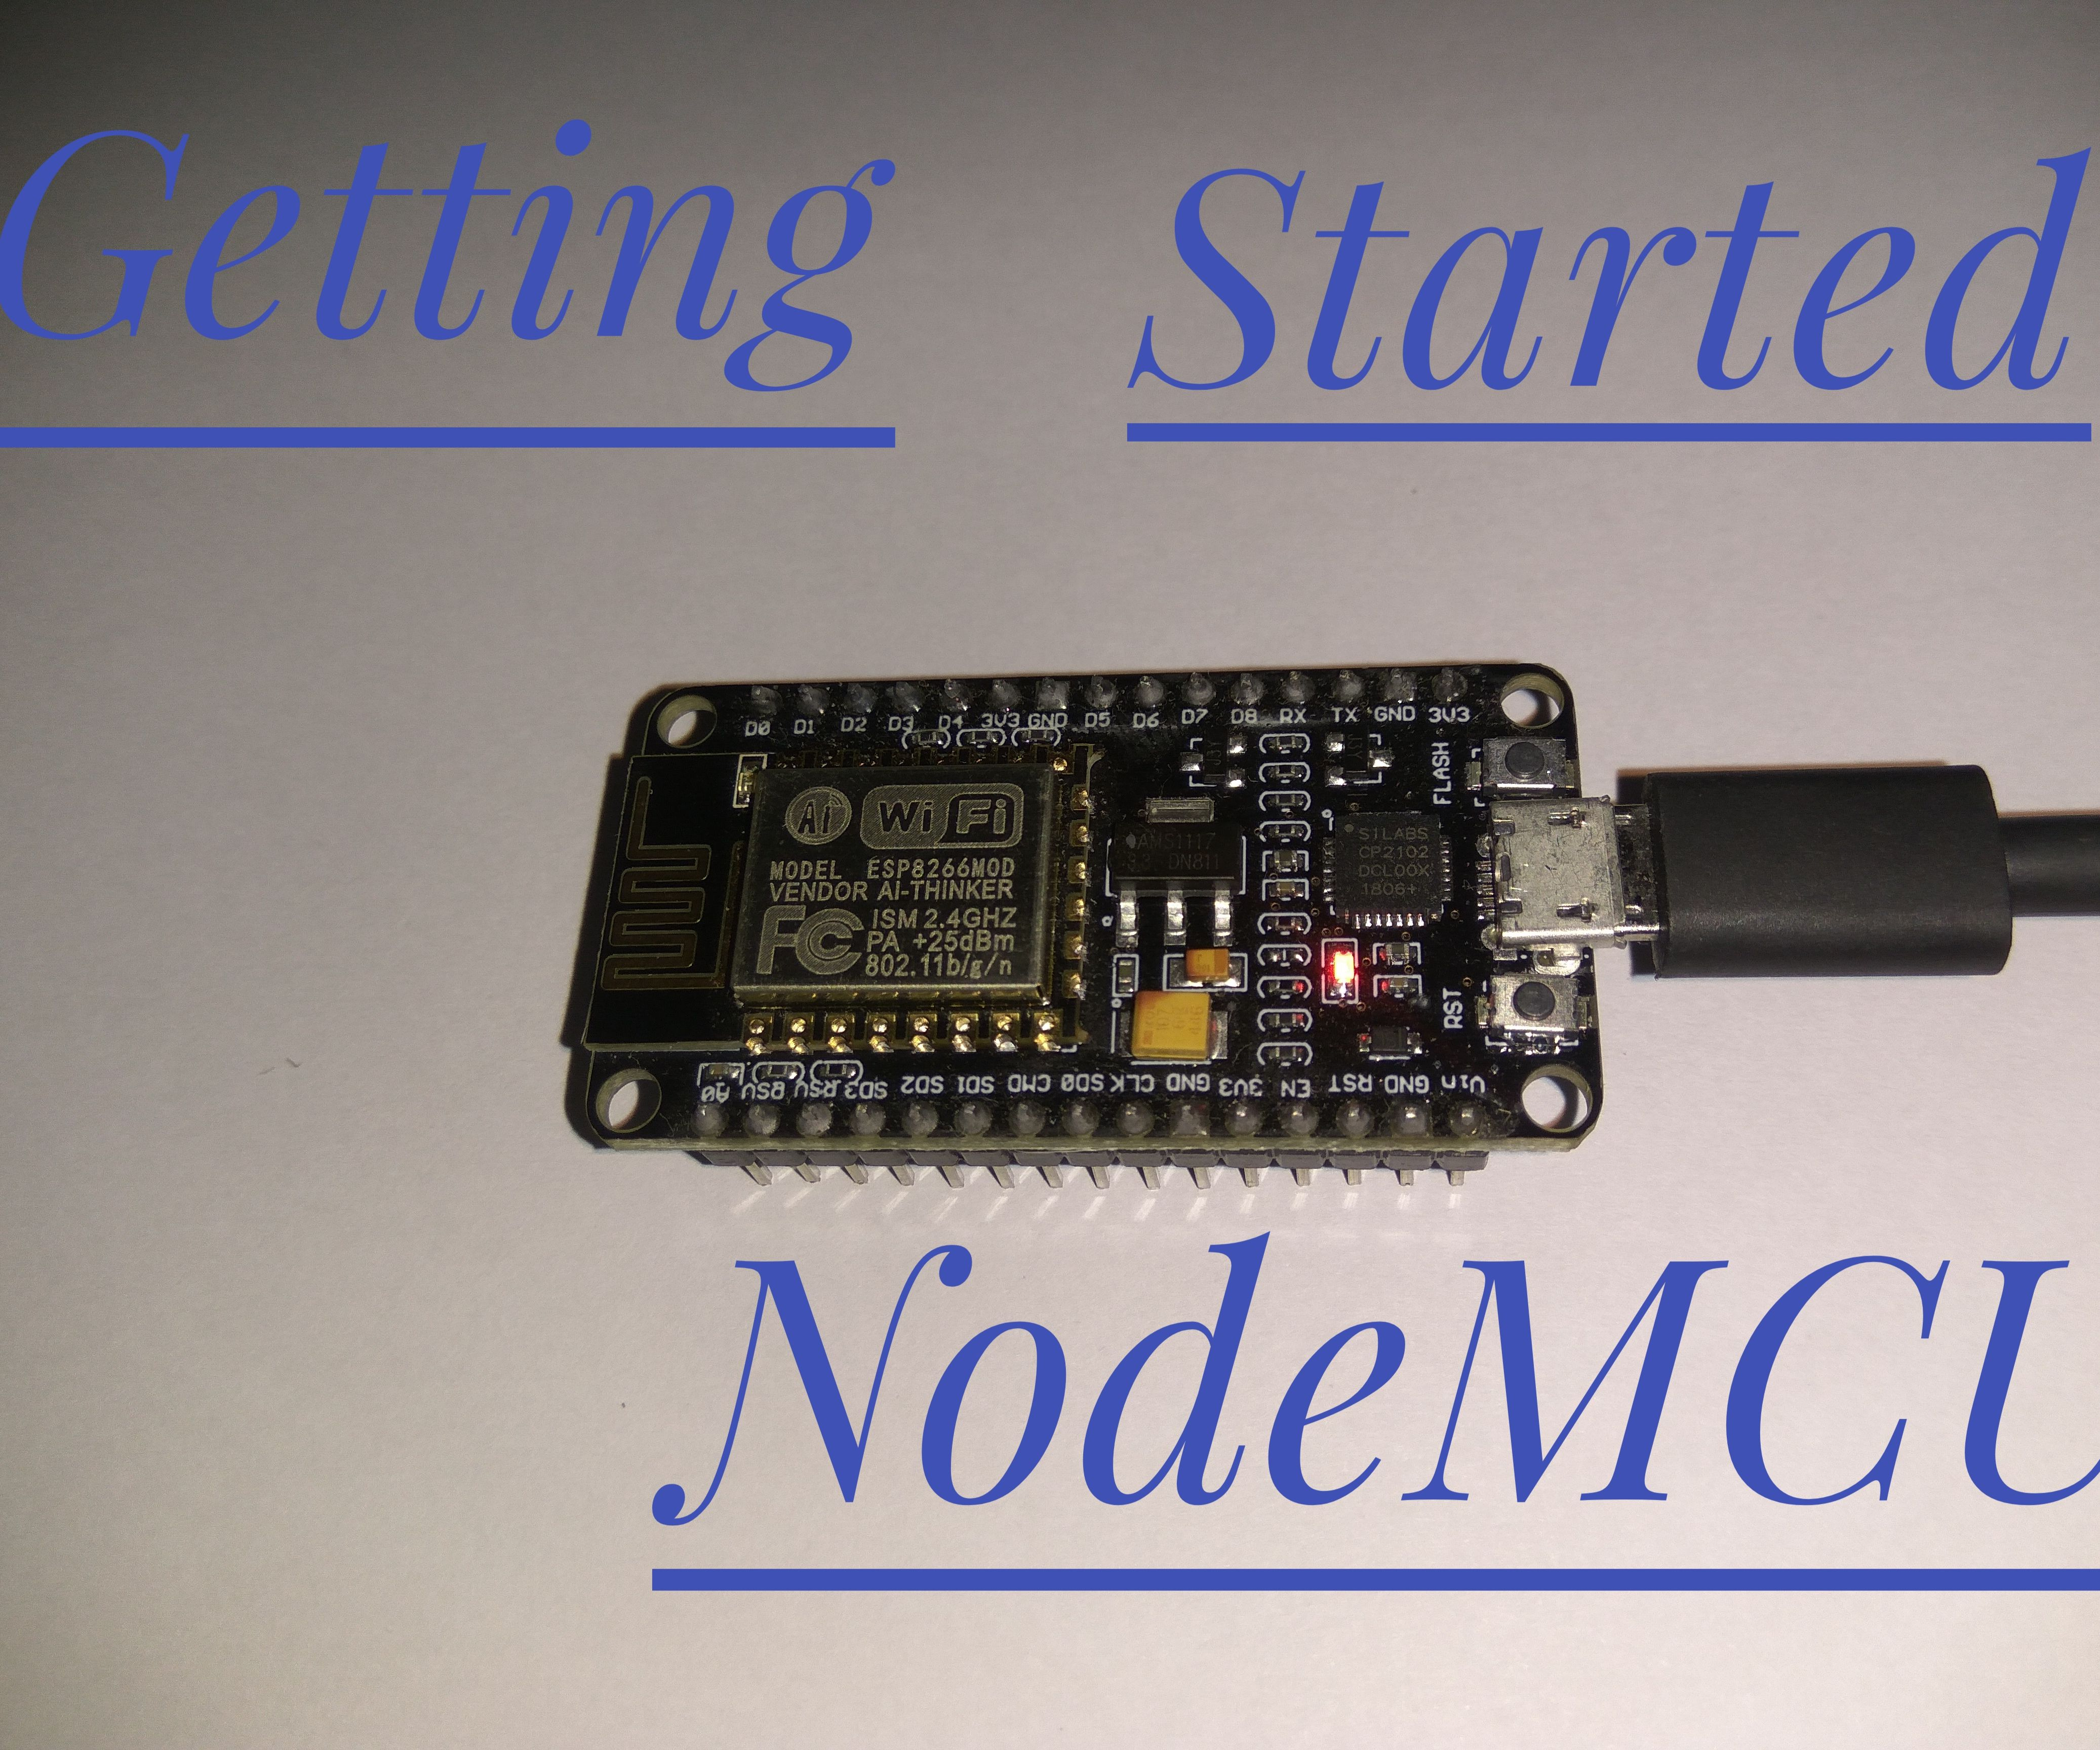 Get Started With NodeMCU (ESP8266)    : 3 Steps